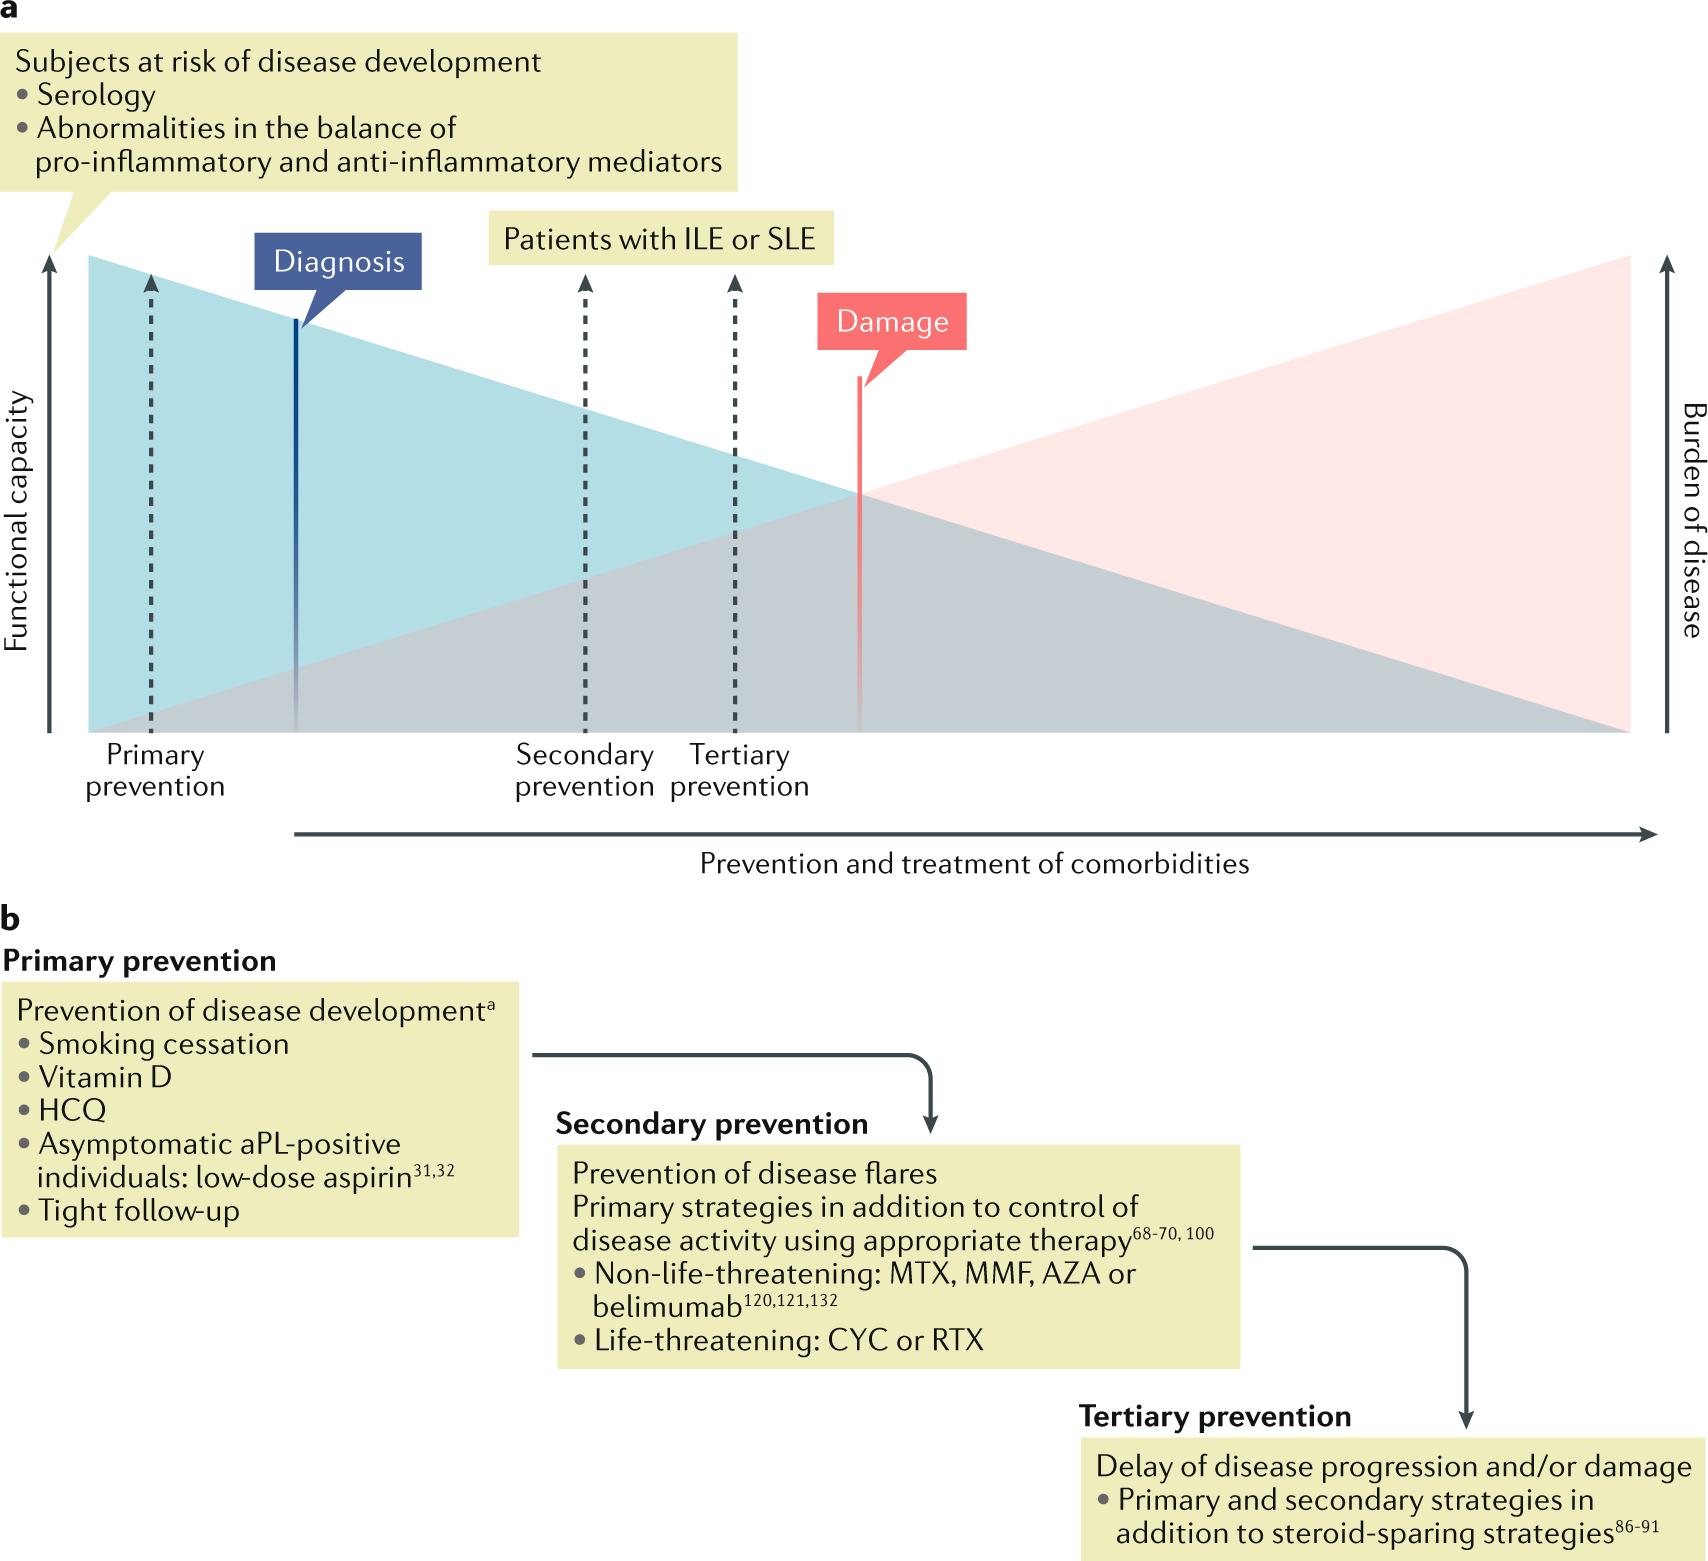 New therapeutic strategies in systemic lupus erythematosus